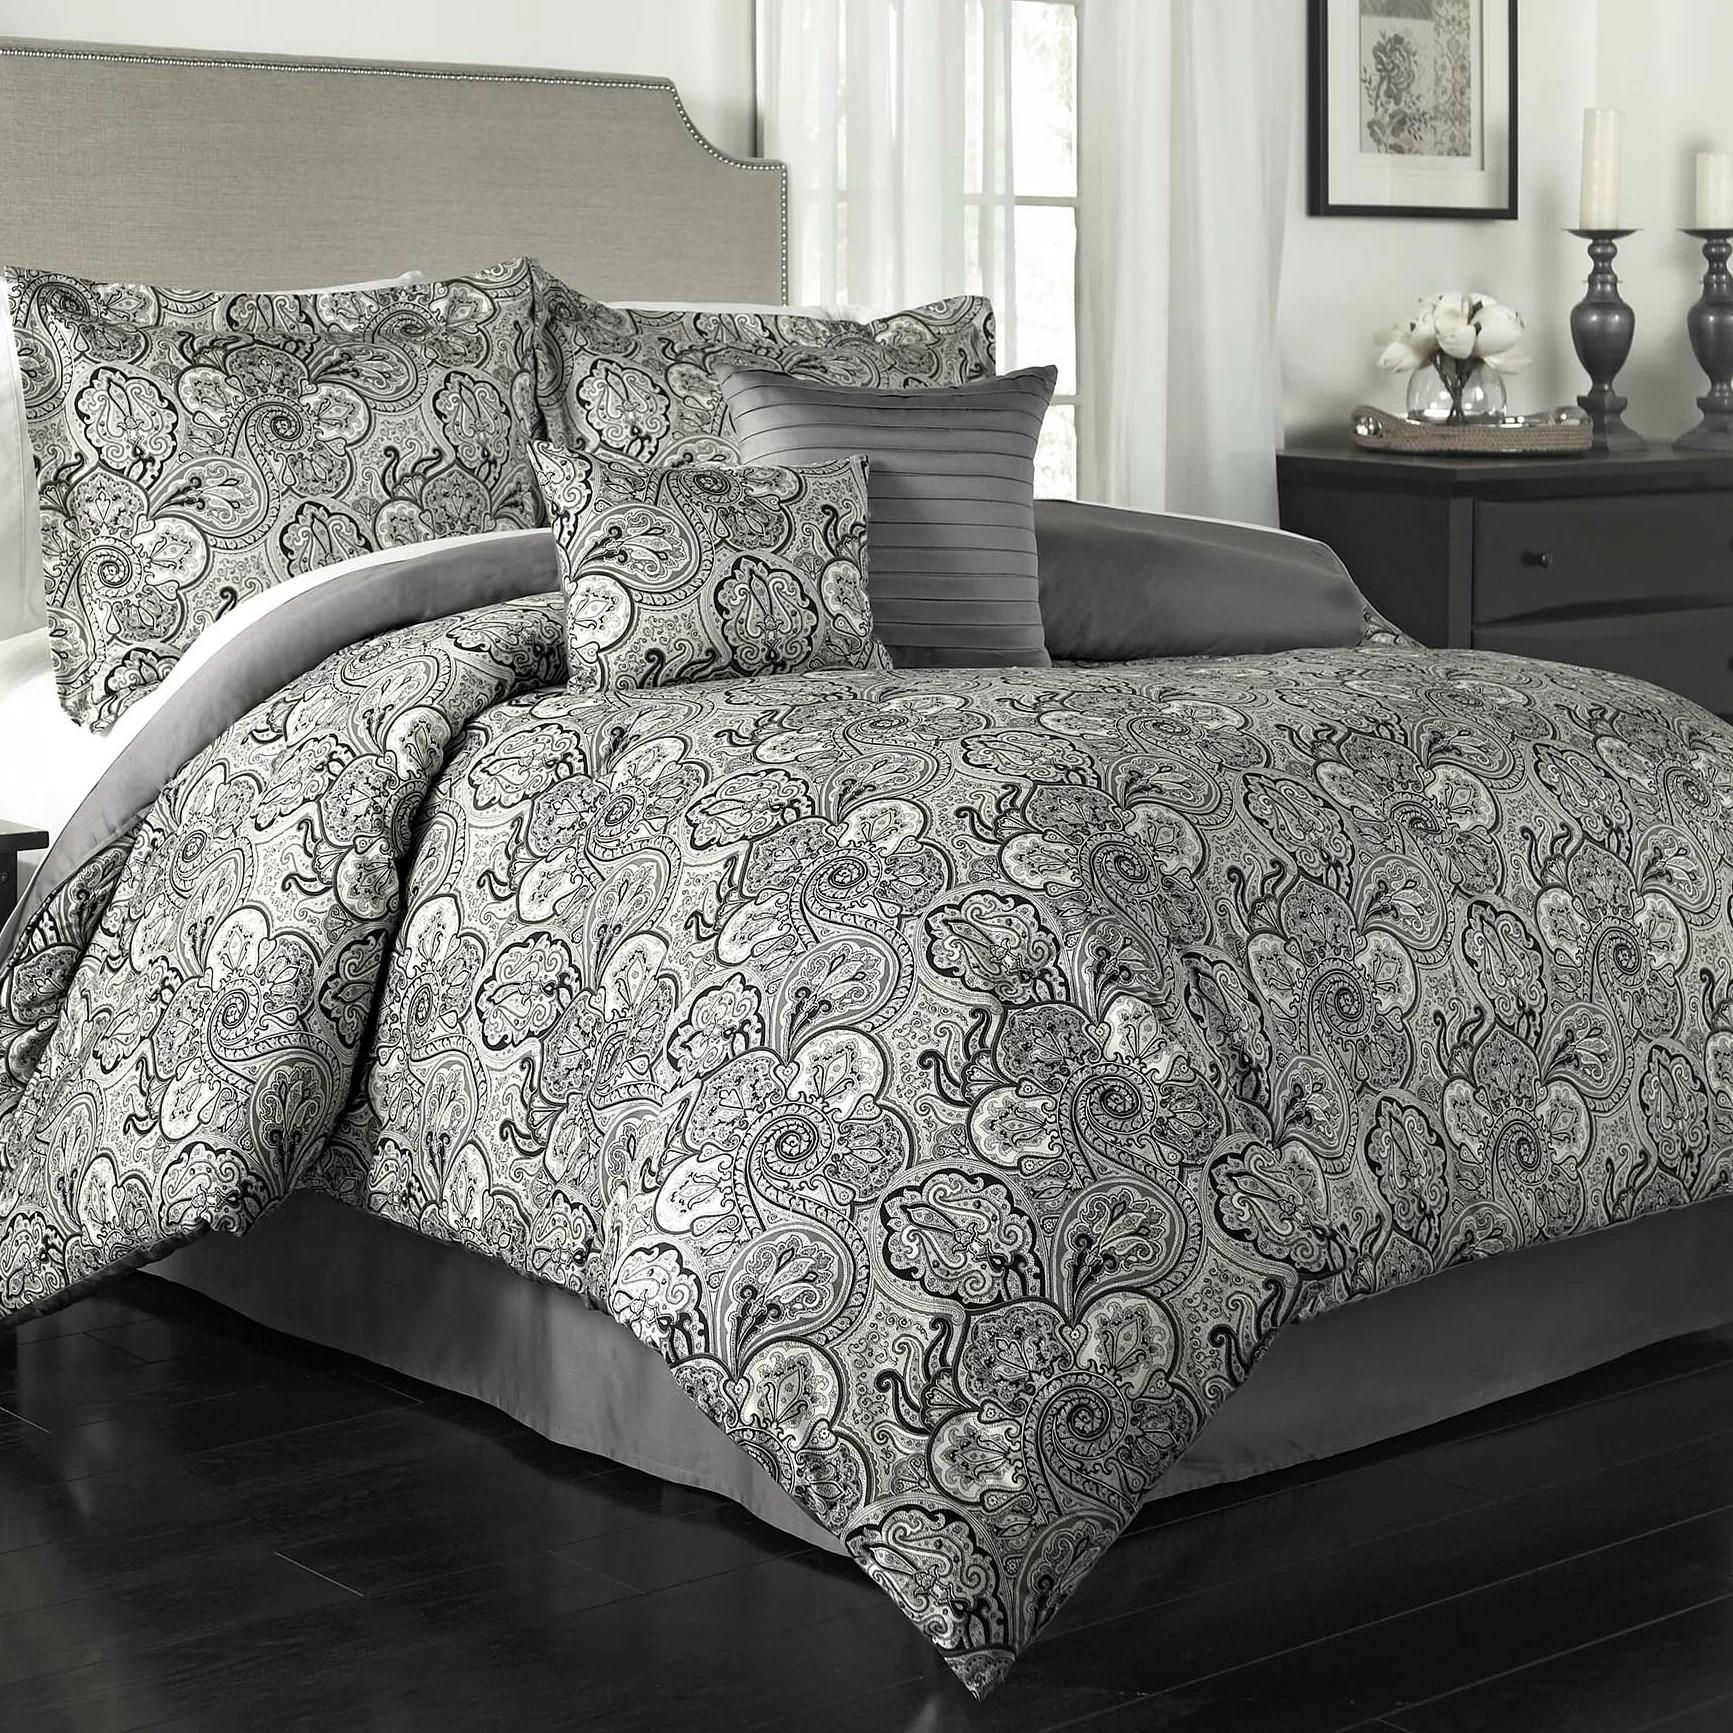 Traditions by Waverly Paddock Shawl 6 Piece Comforter Set